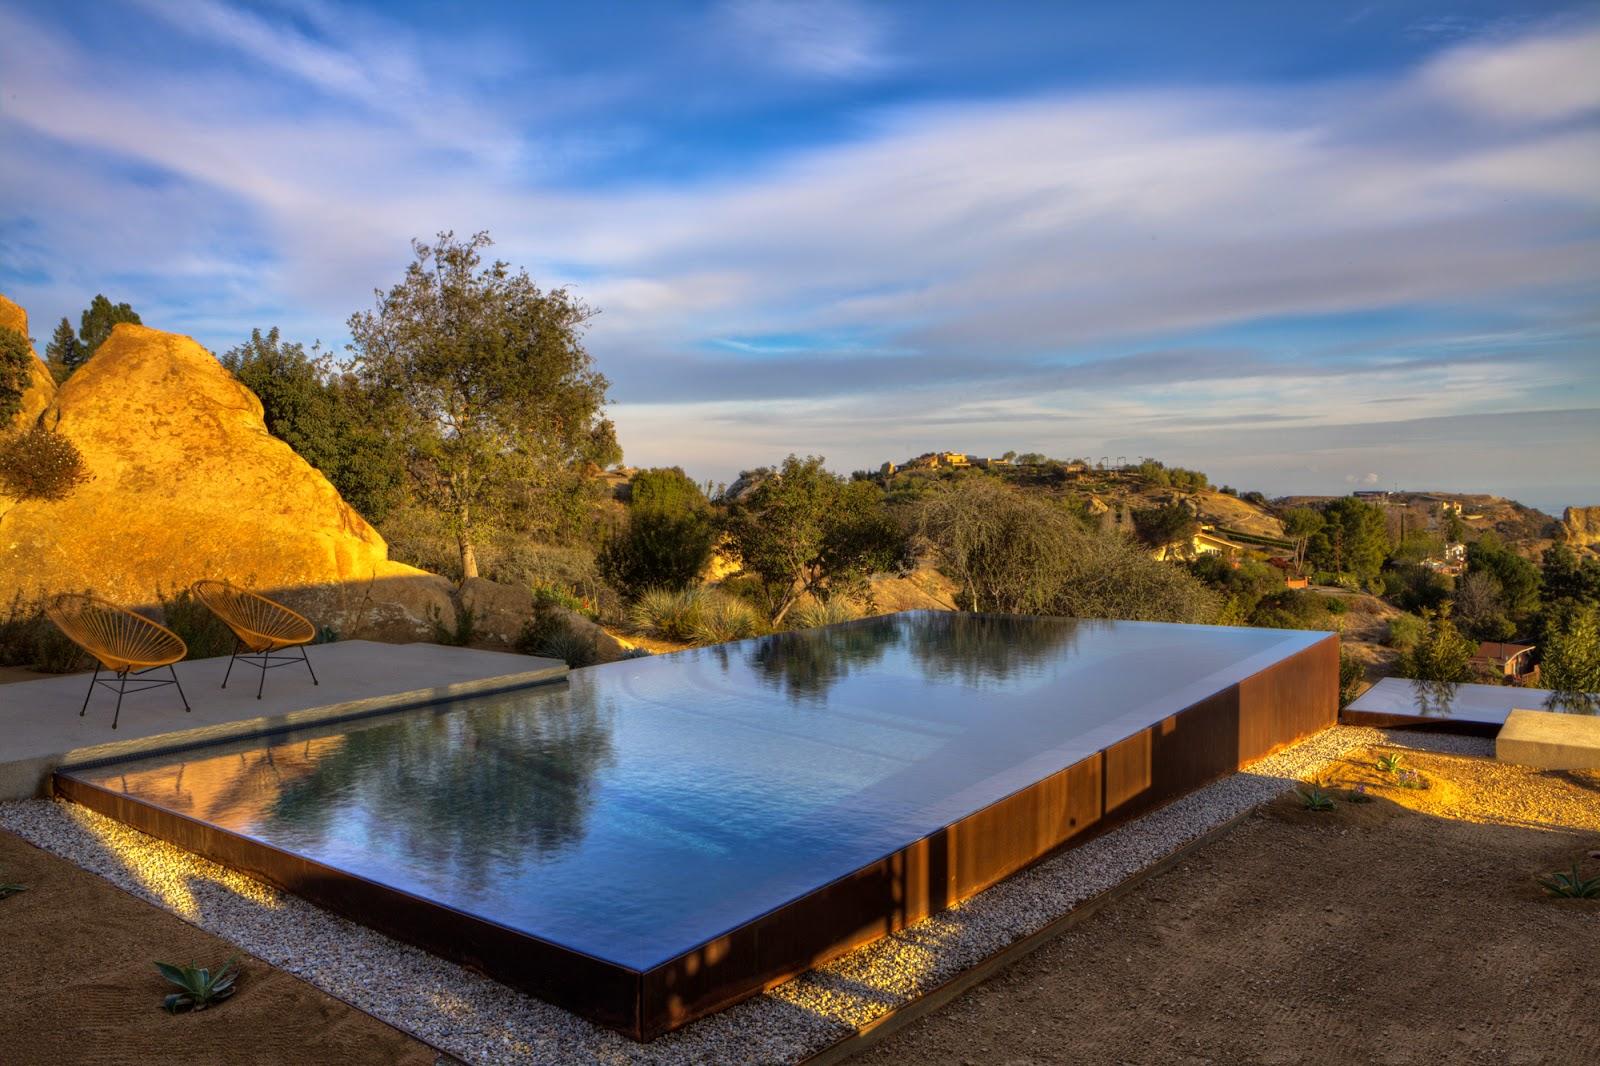 glass tile pool, glass tile spa, infinity edge pool, corten steel, Los Angeles, CA